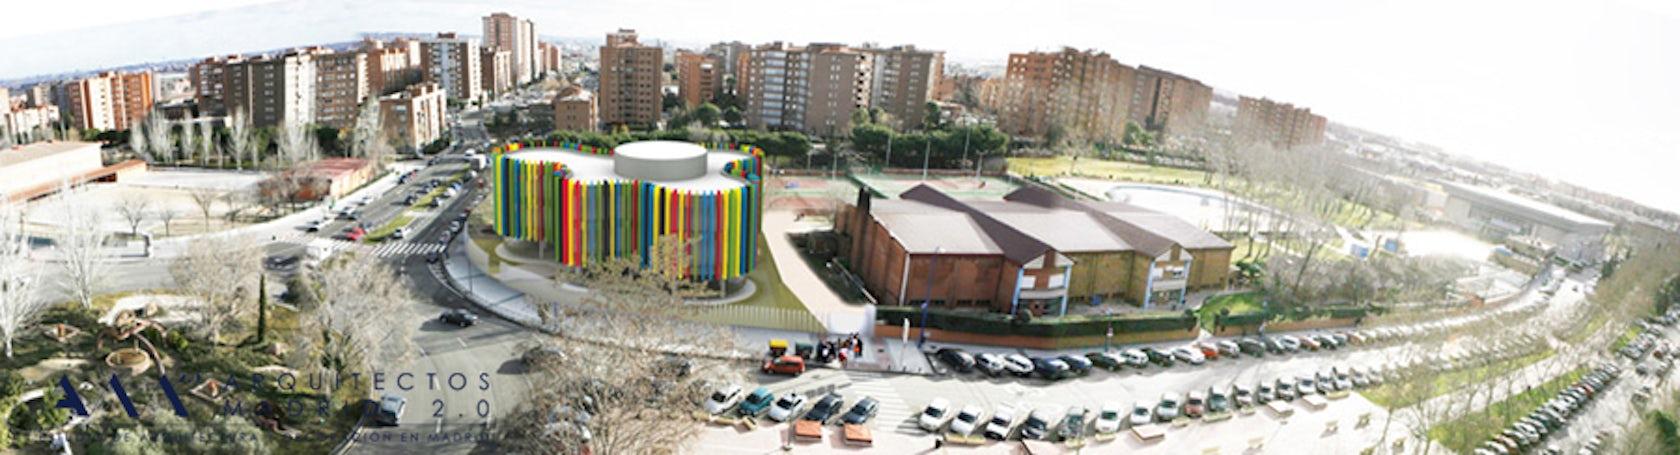 Office center for sport proyecto de oficinas para el for Oficina qualitas auto madrid